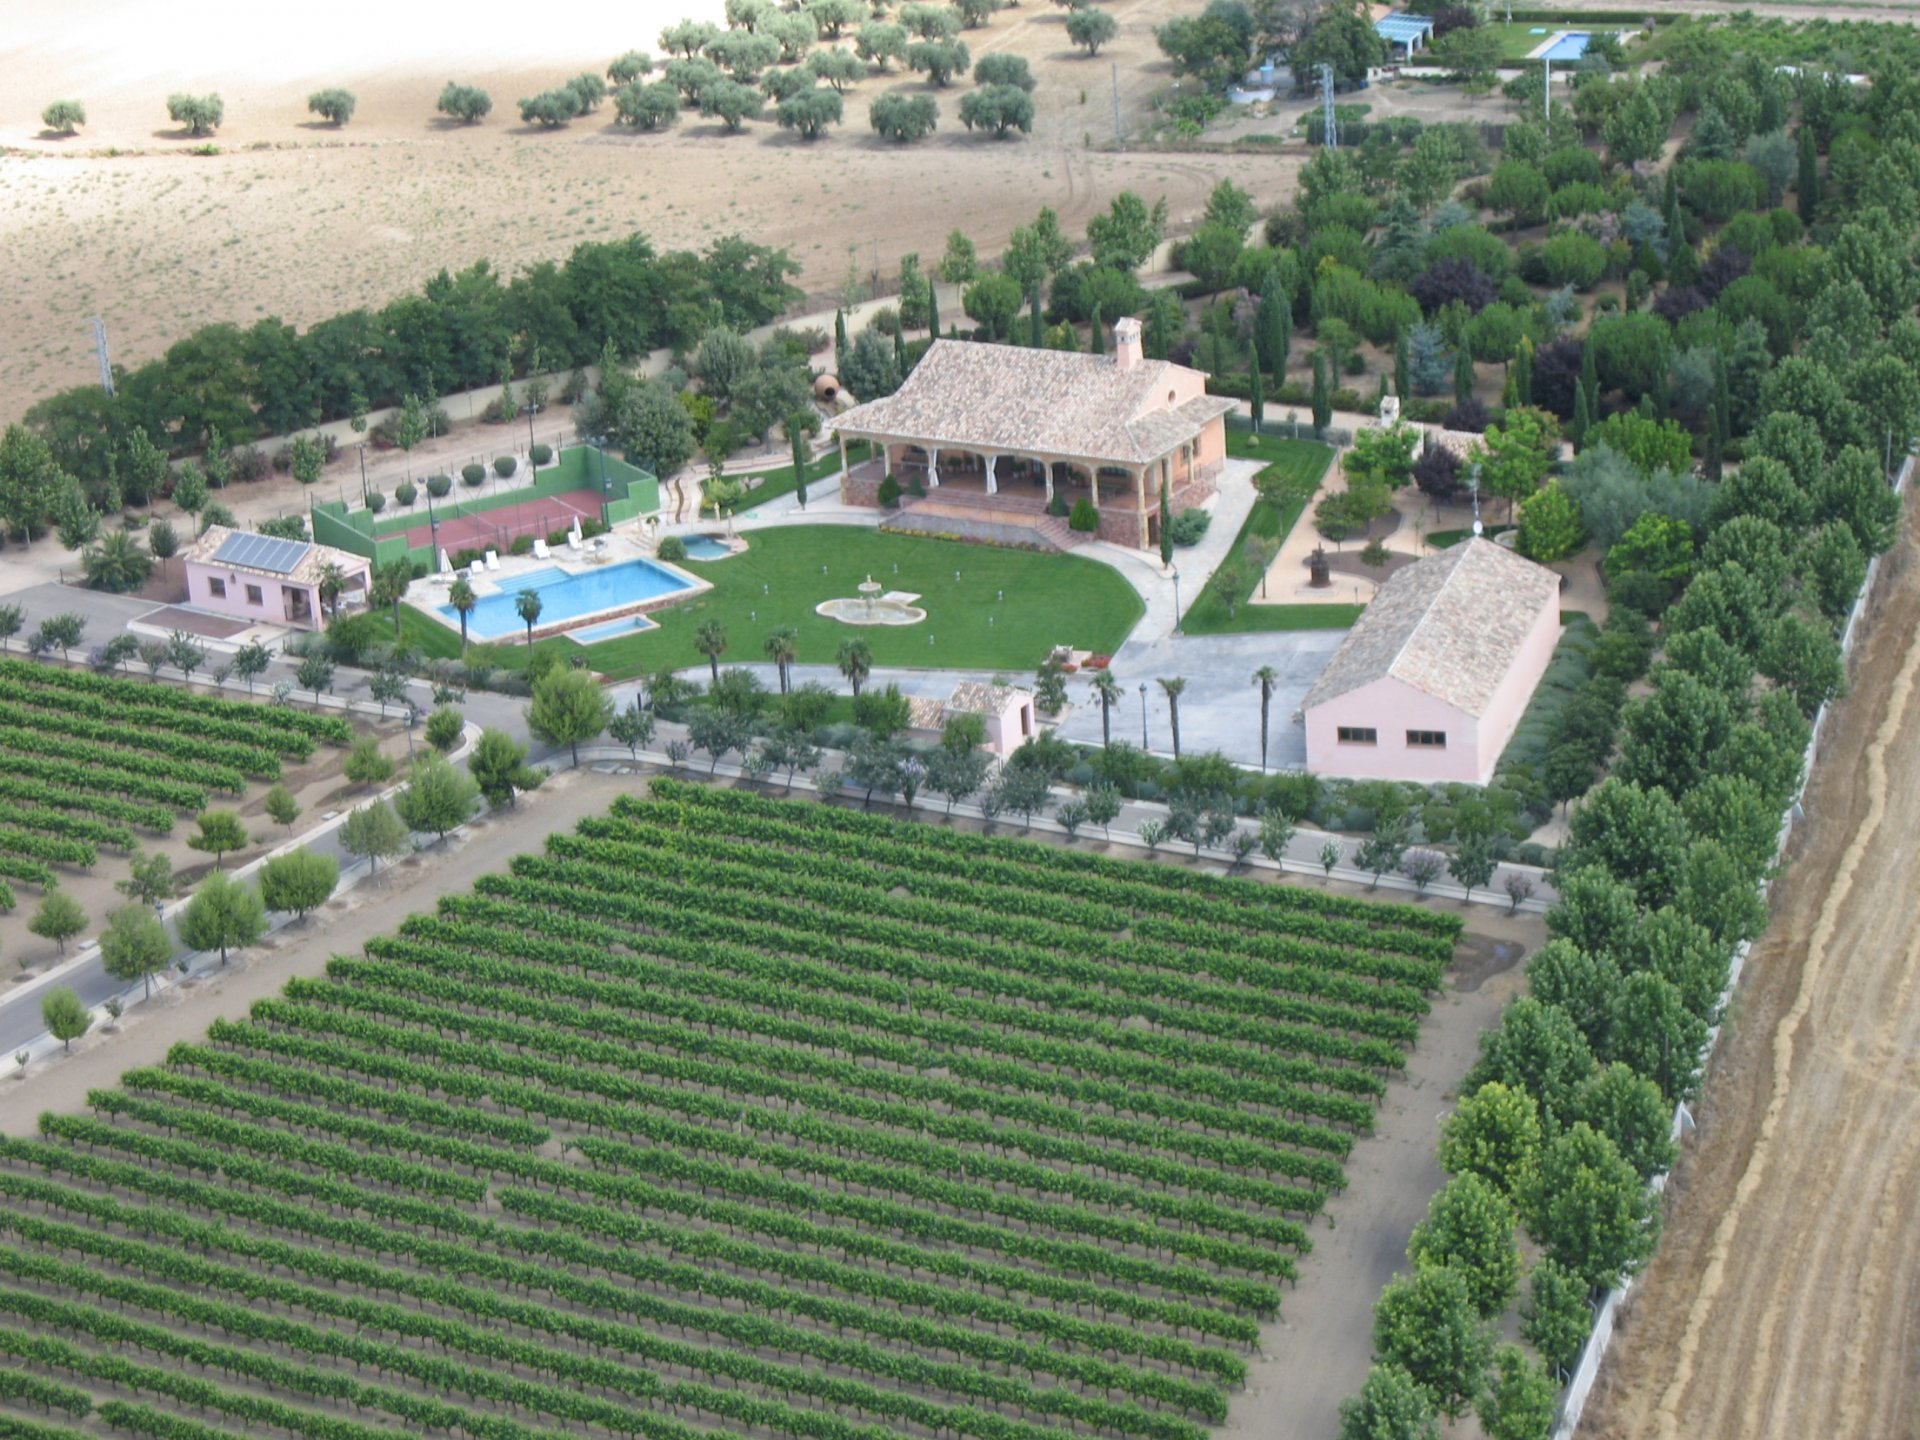 Ad sale house madrid otras zonas 28000 john taylor - Illescas garden ...